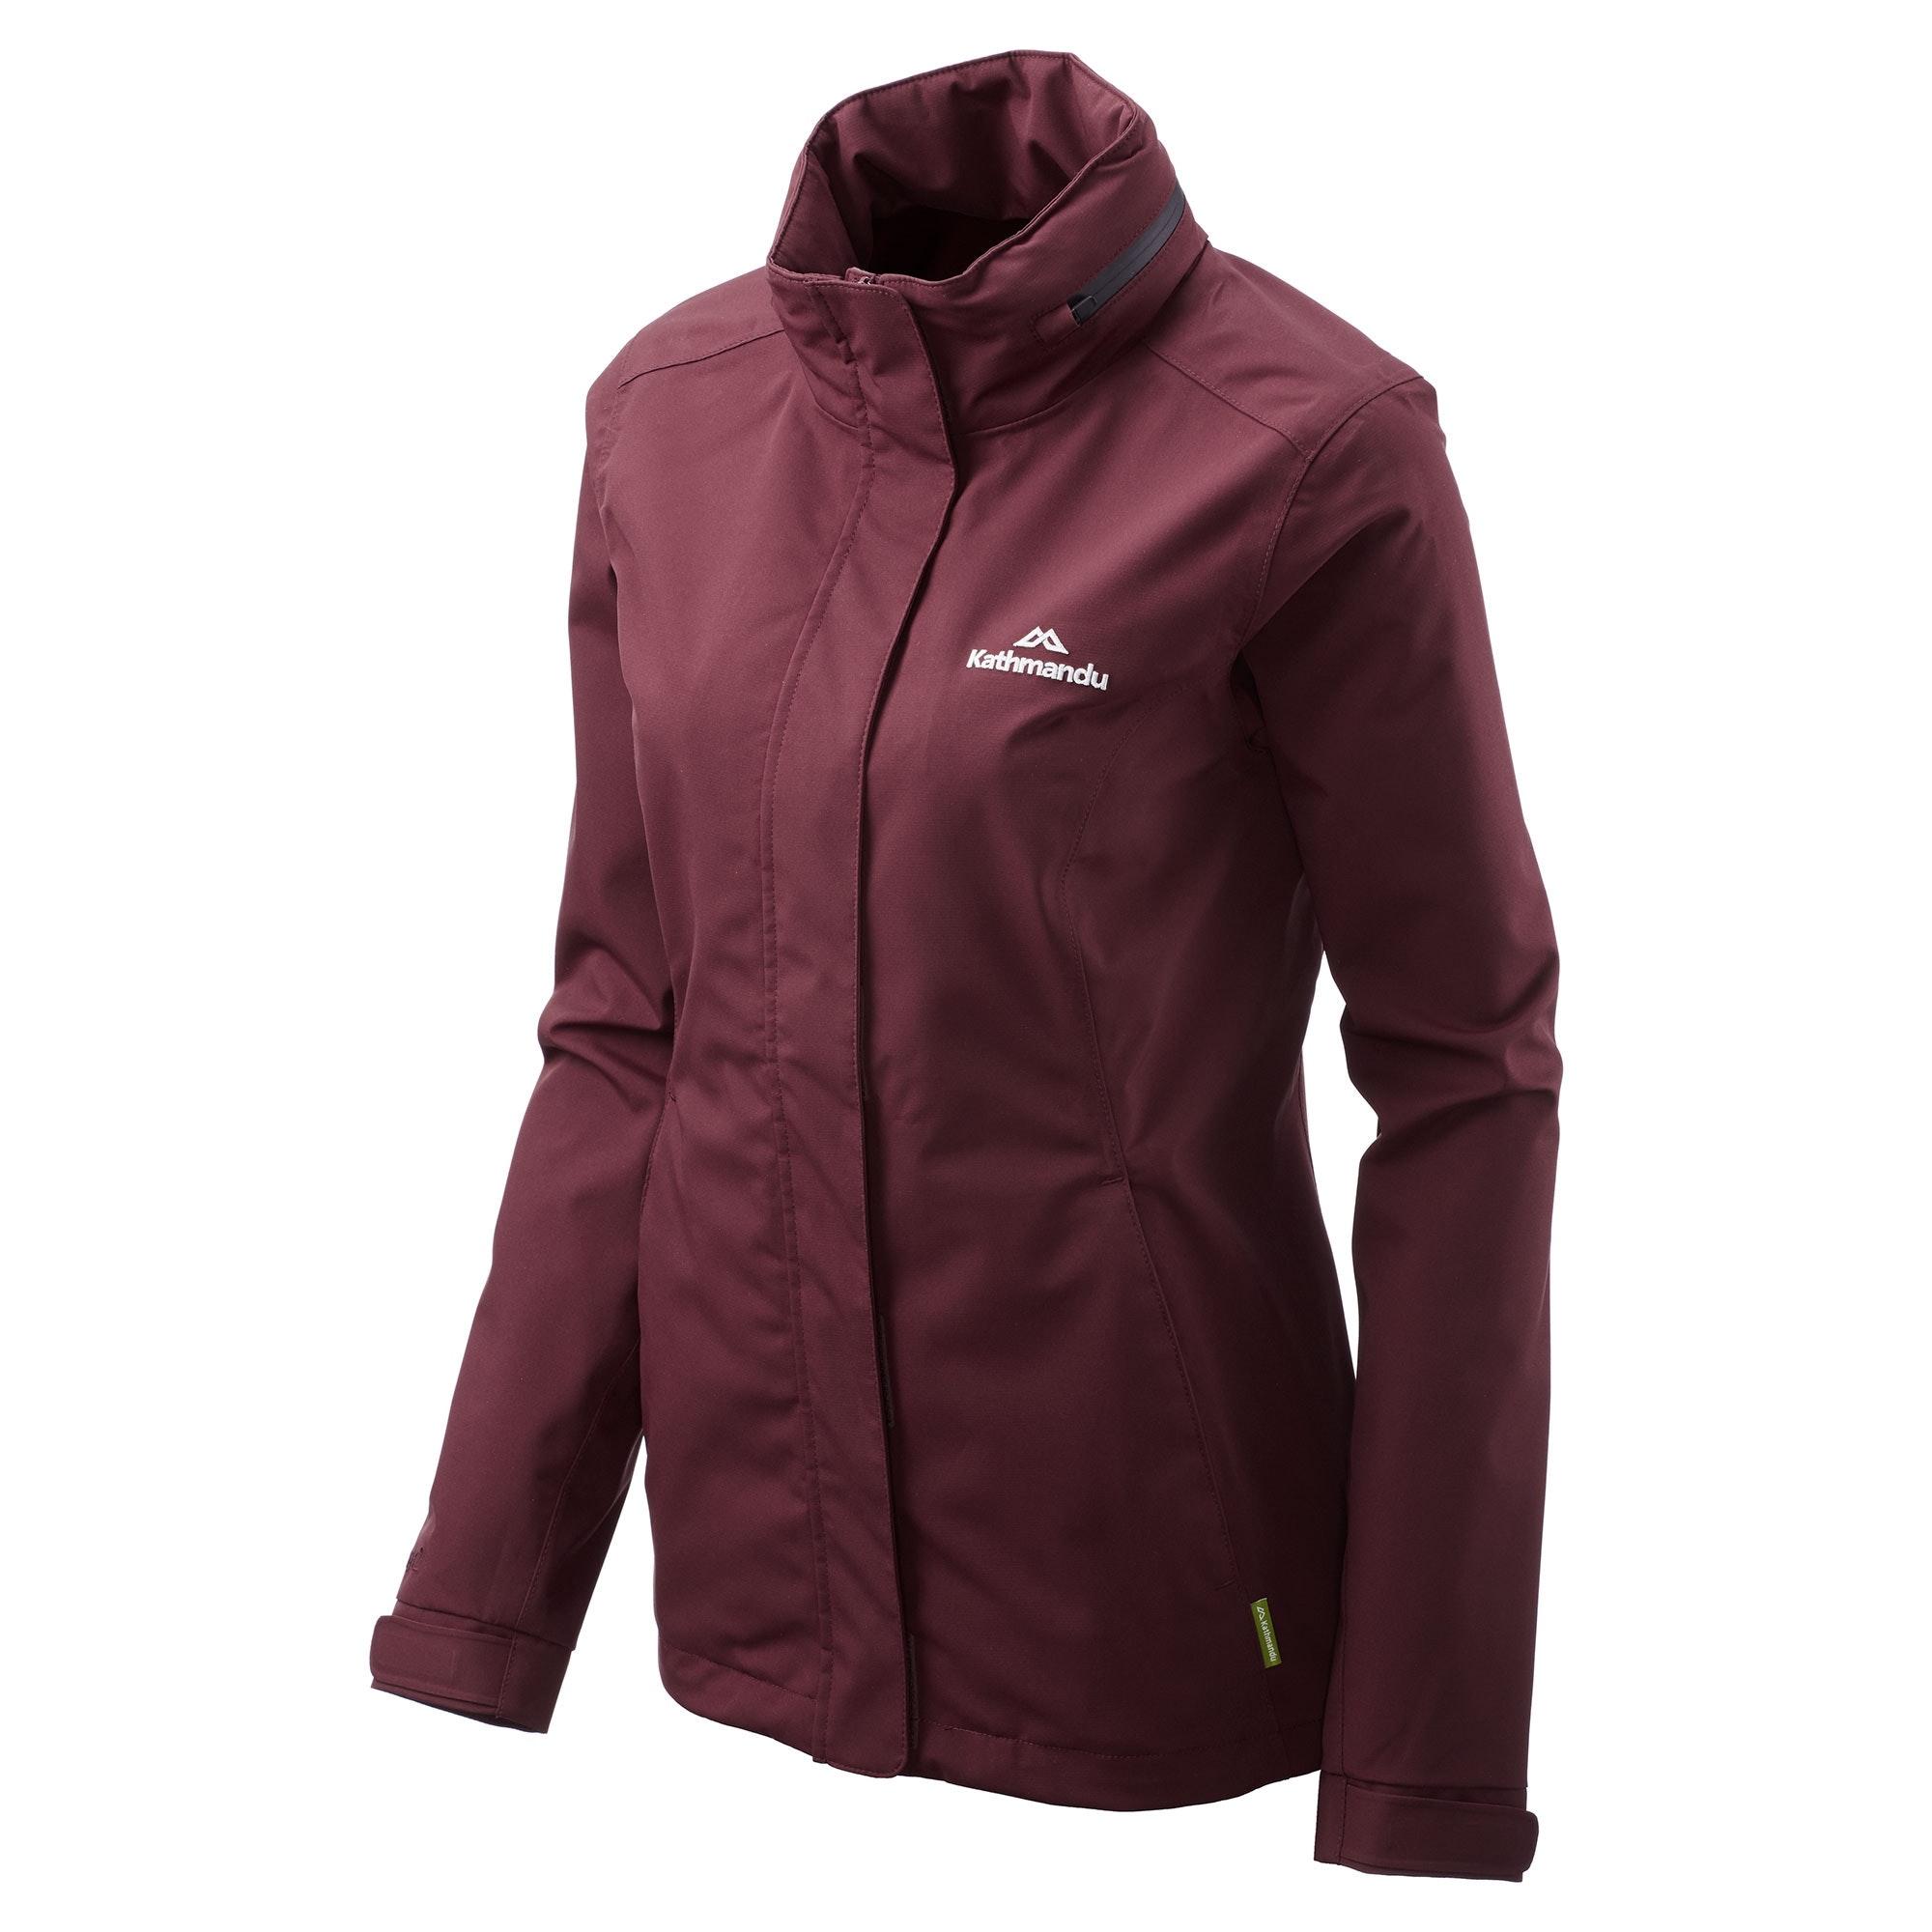 Kathmandu-Andulo-Womens-2-Layer-Windproof-Waterproof-Outdoor-Hiking-Rain-Jacket thumbnail 23